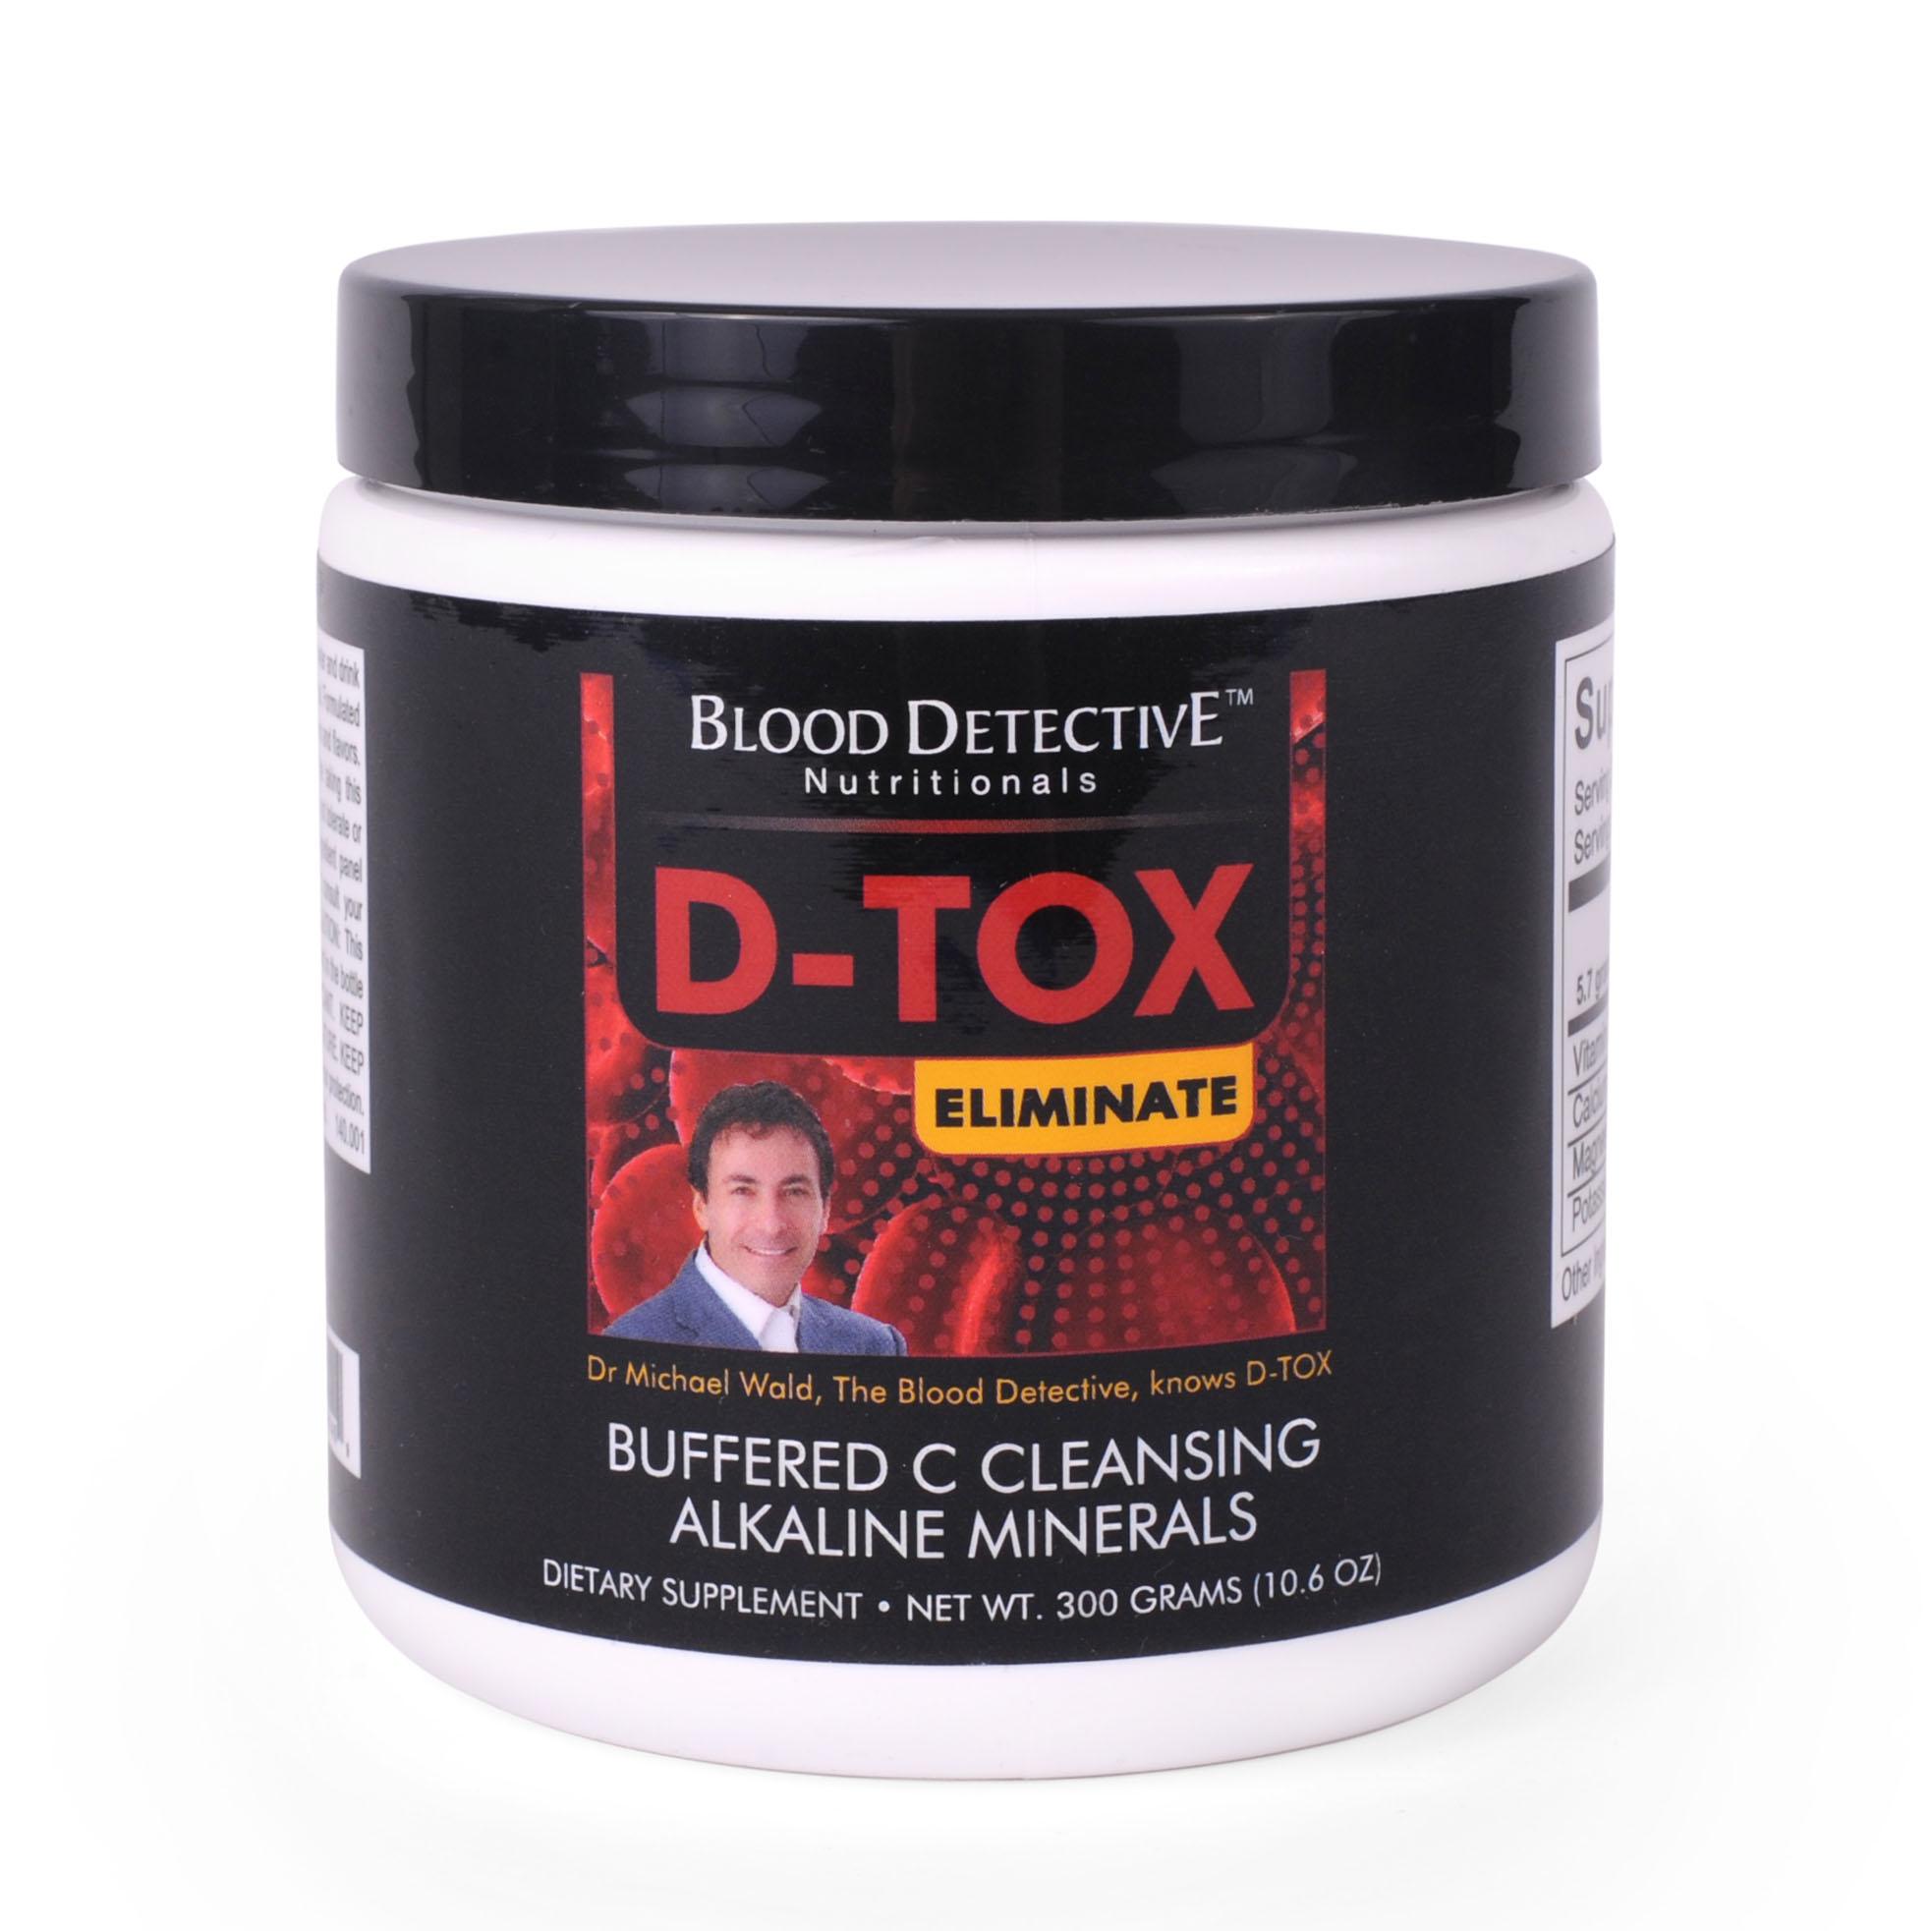 d-tox eliminate